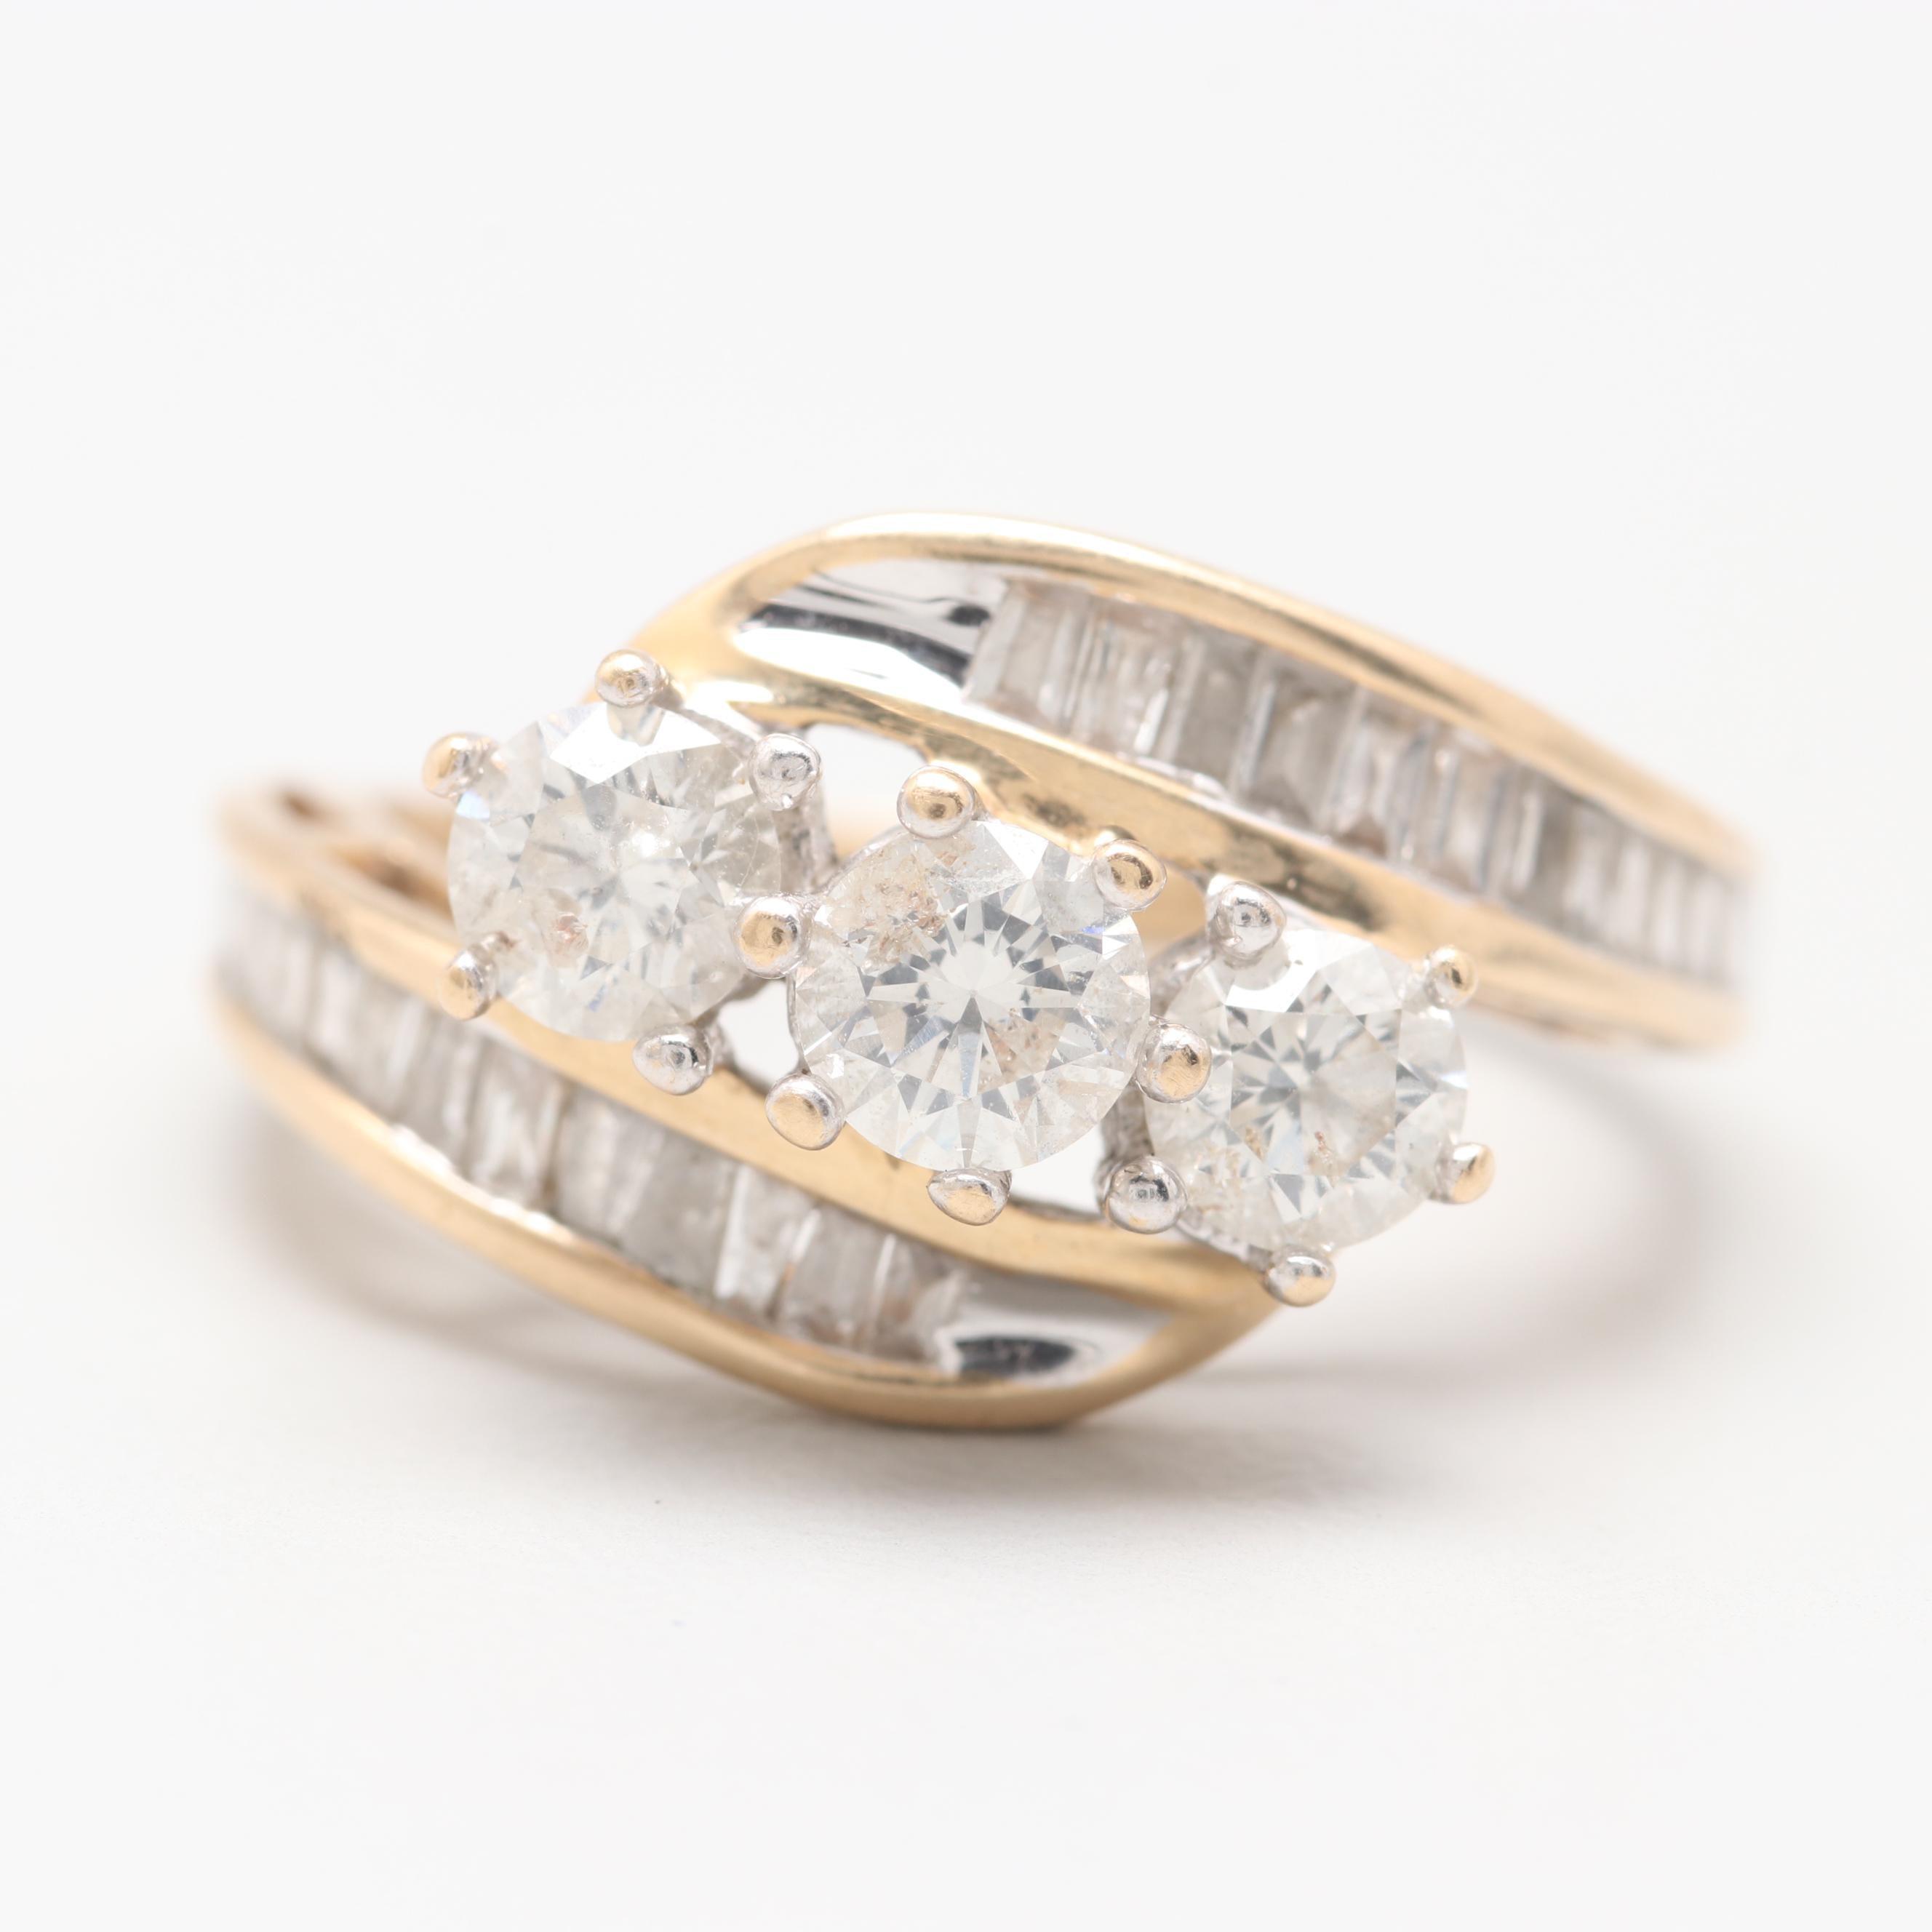 14K Yellow Gold 1.49 CTW Diamond Ring